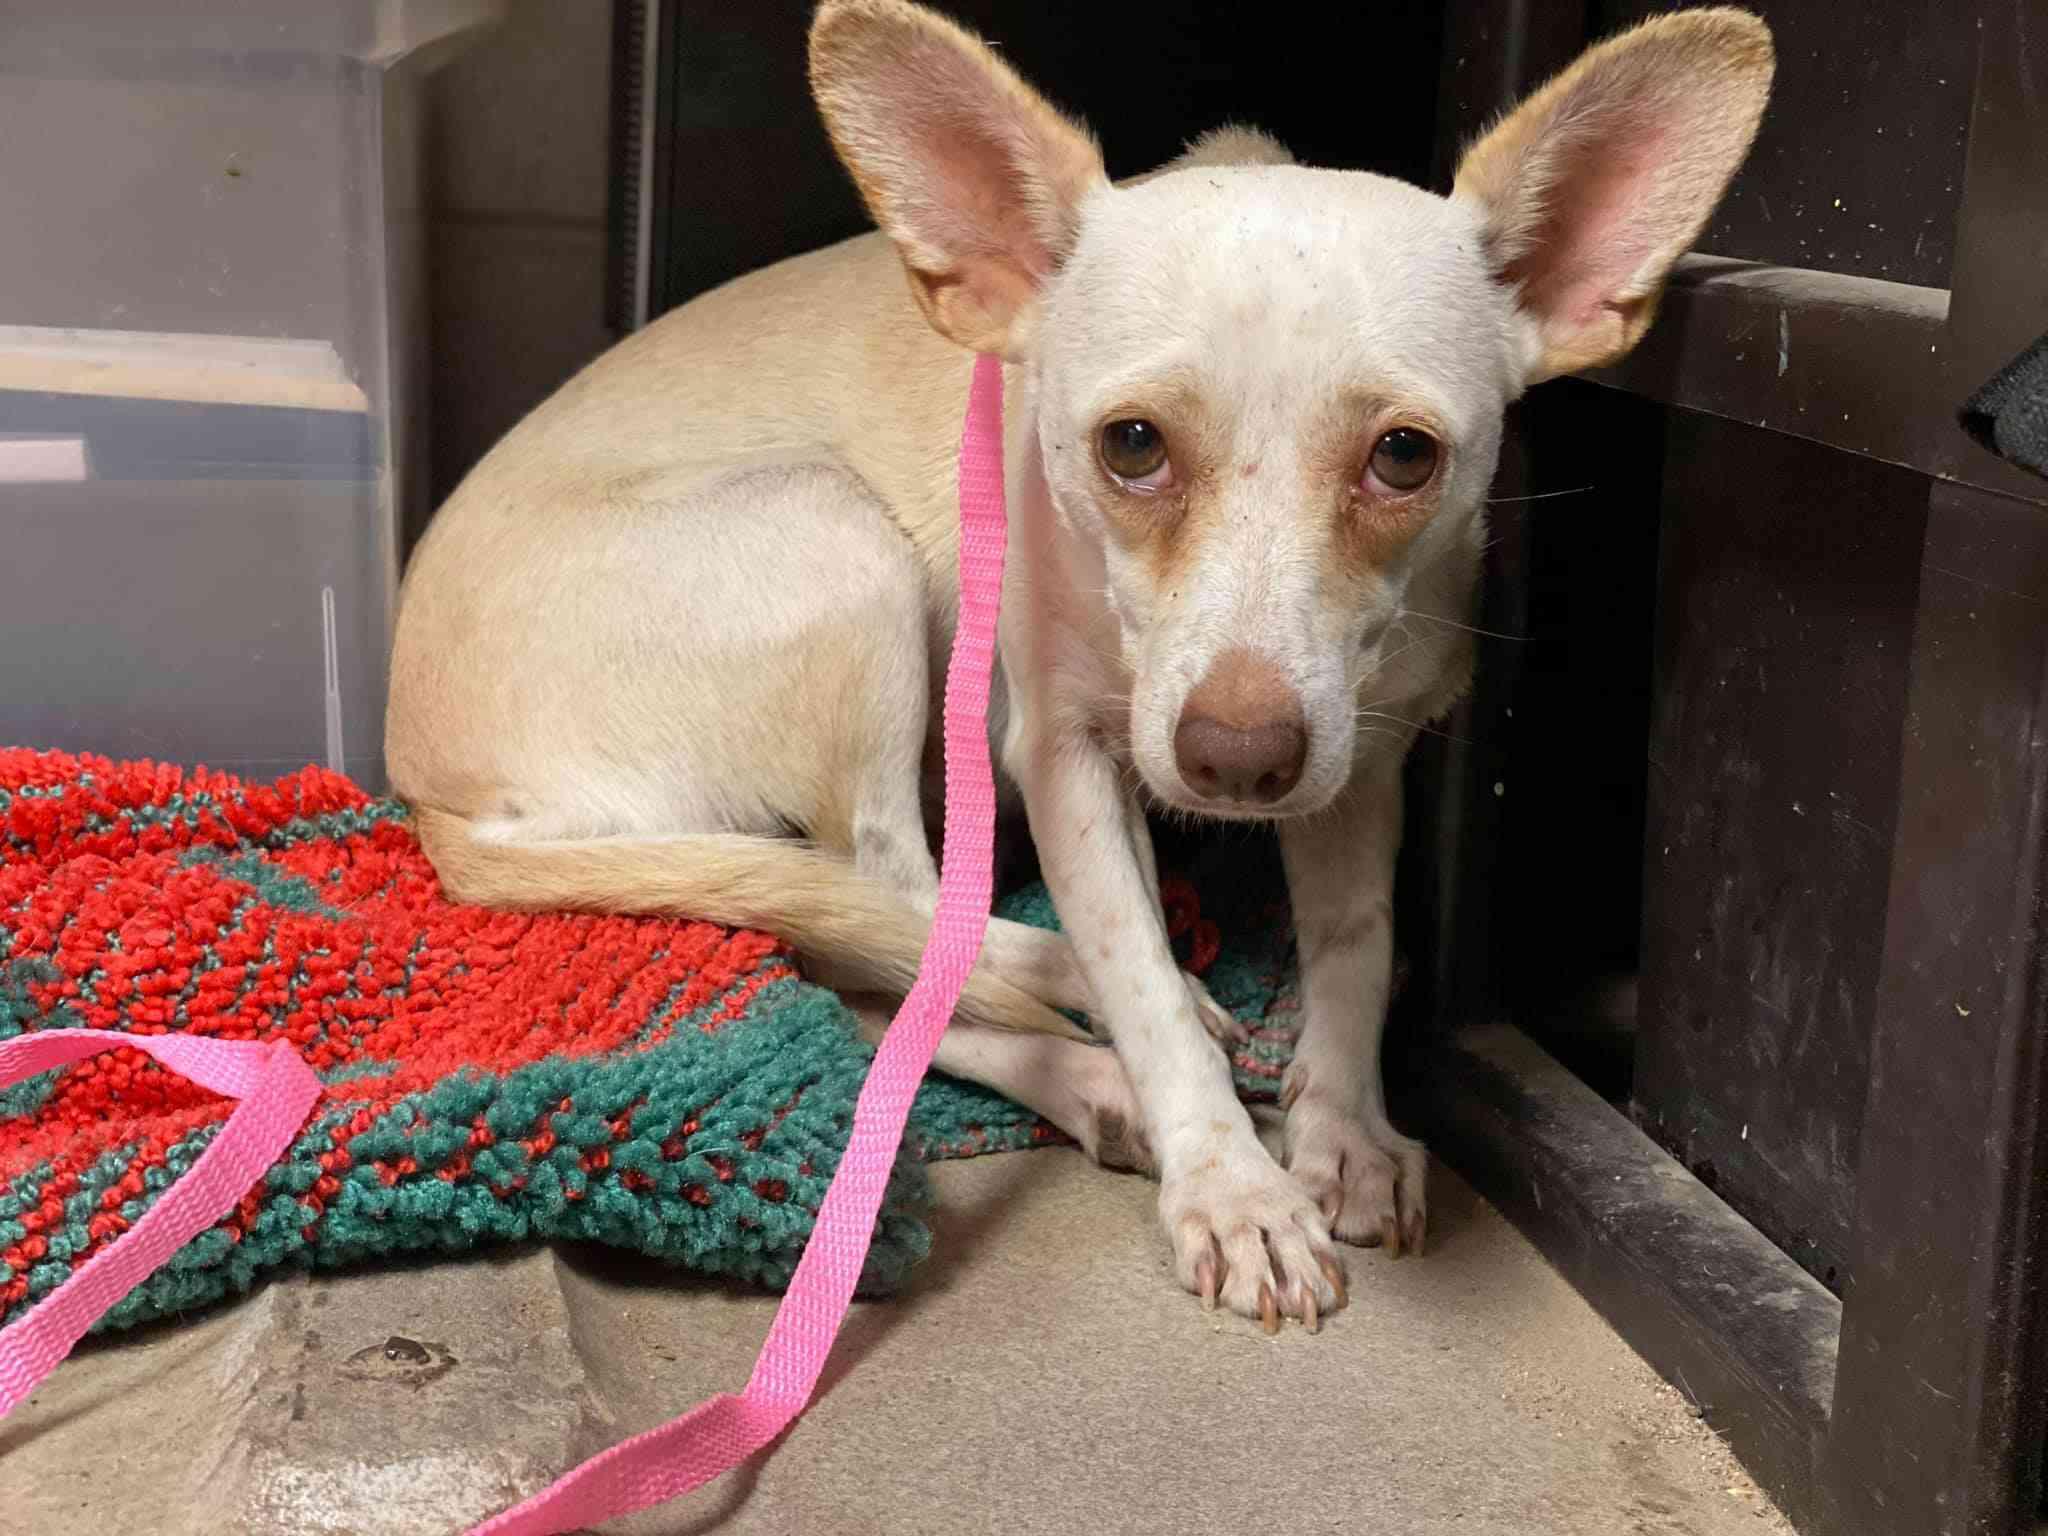 scared dog in animal shelter